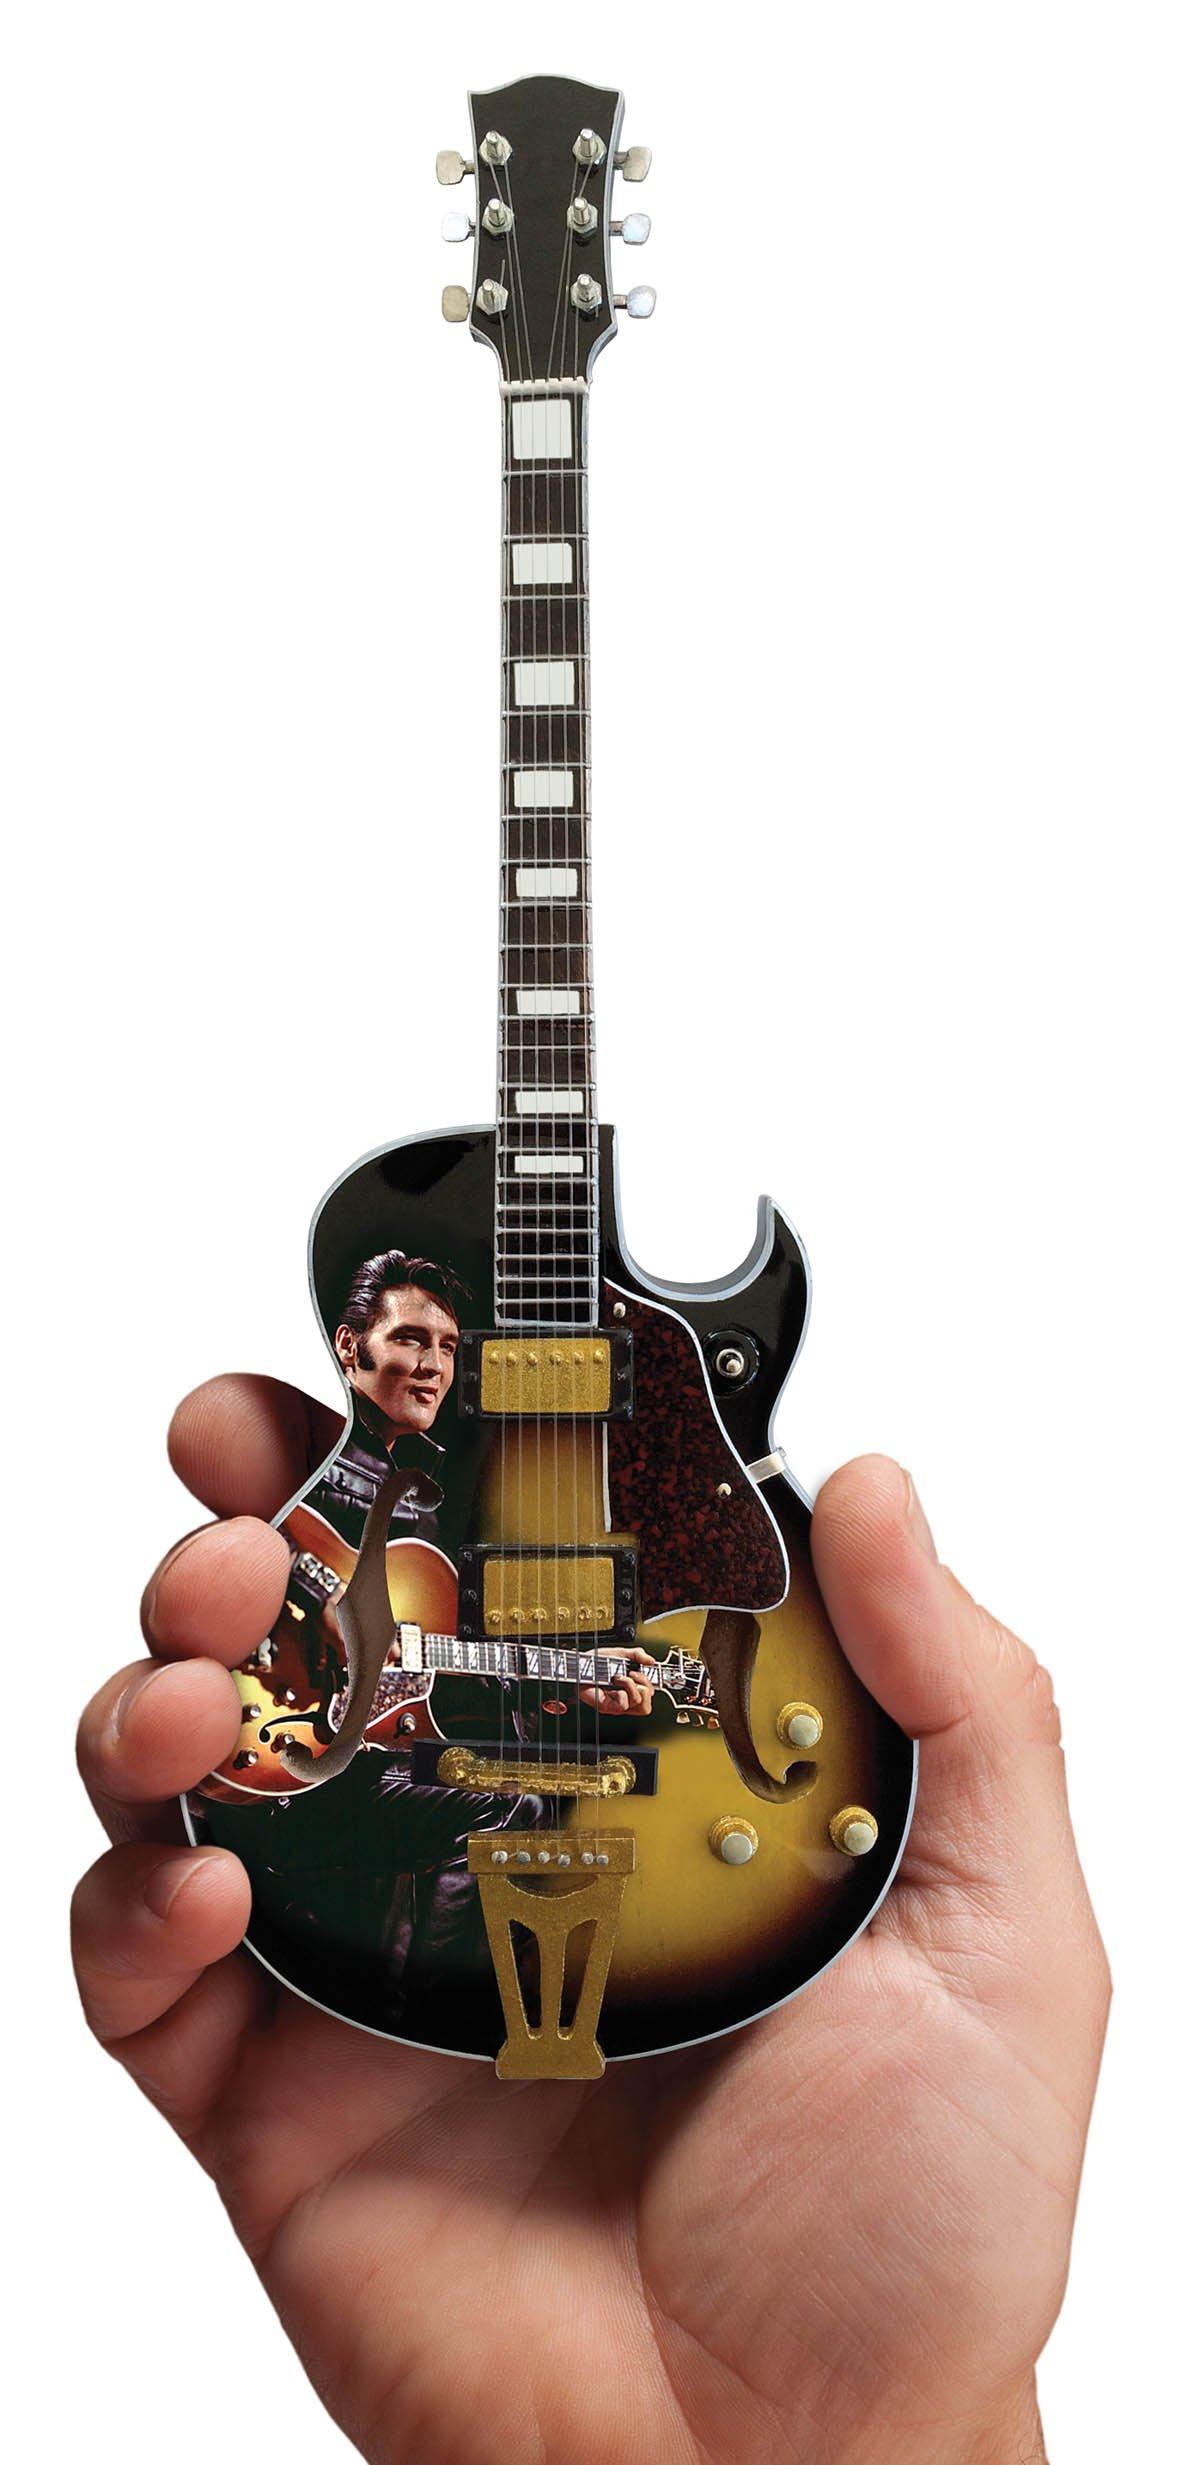 Axe Heaven EP-361 Licensed Elvis Presley '68 Special Hollow Body Mini Guitar Replica